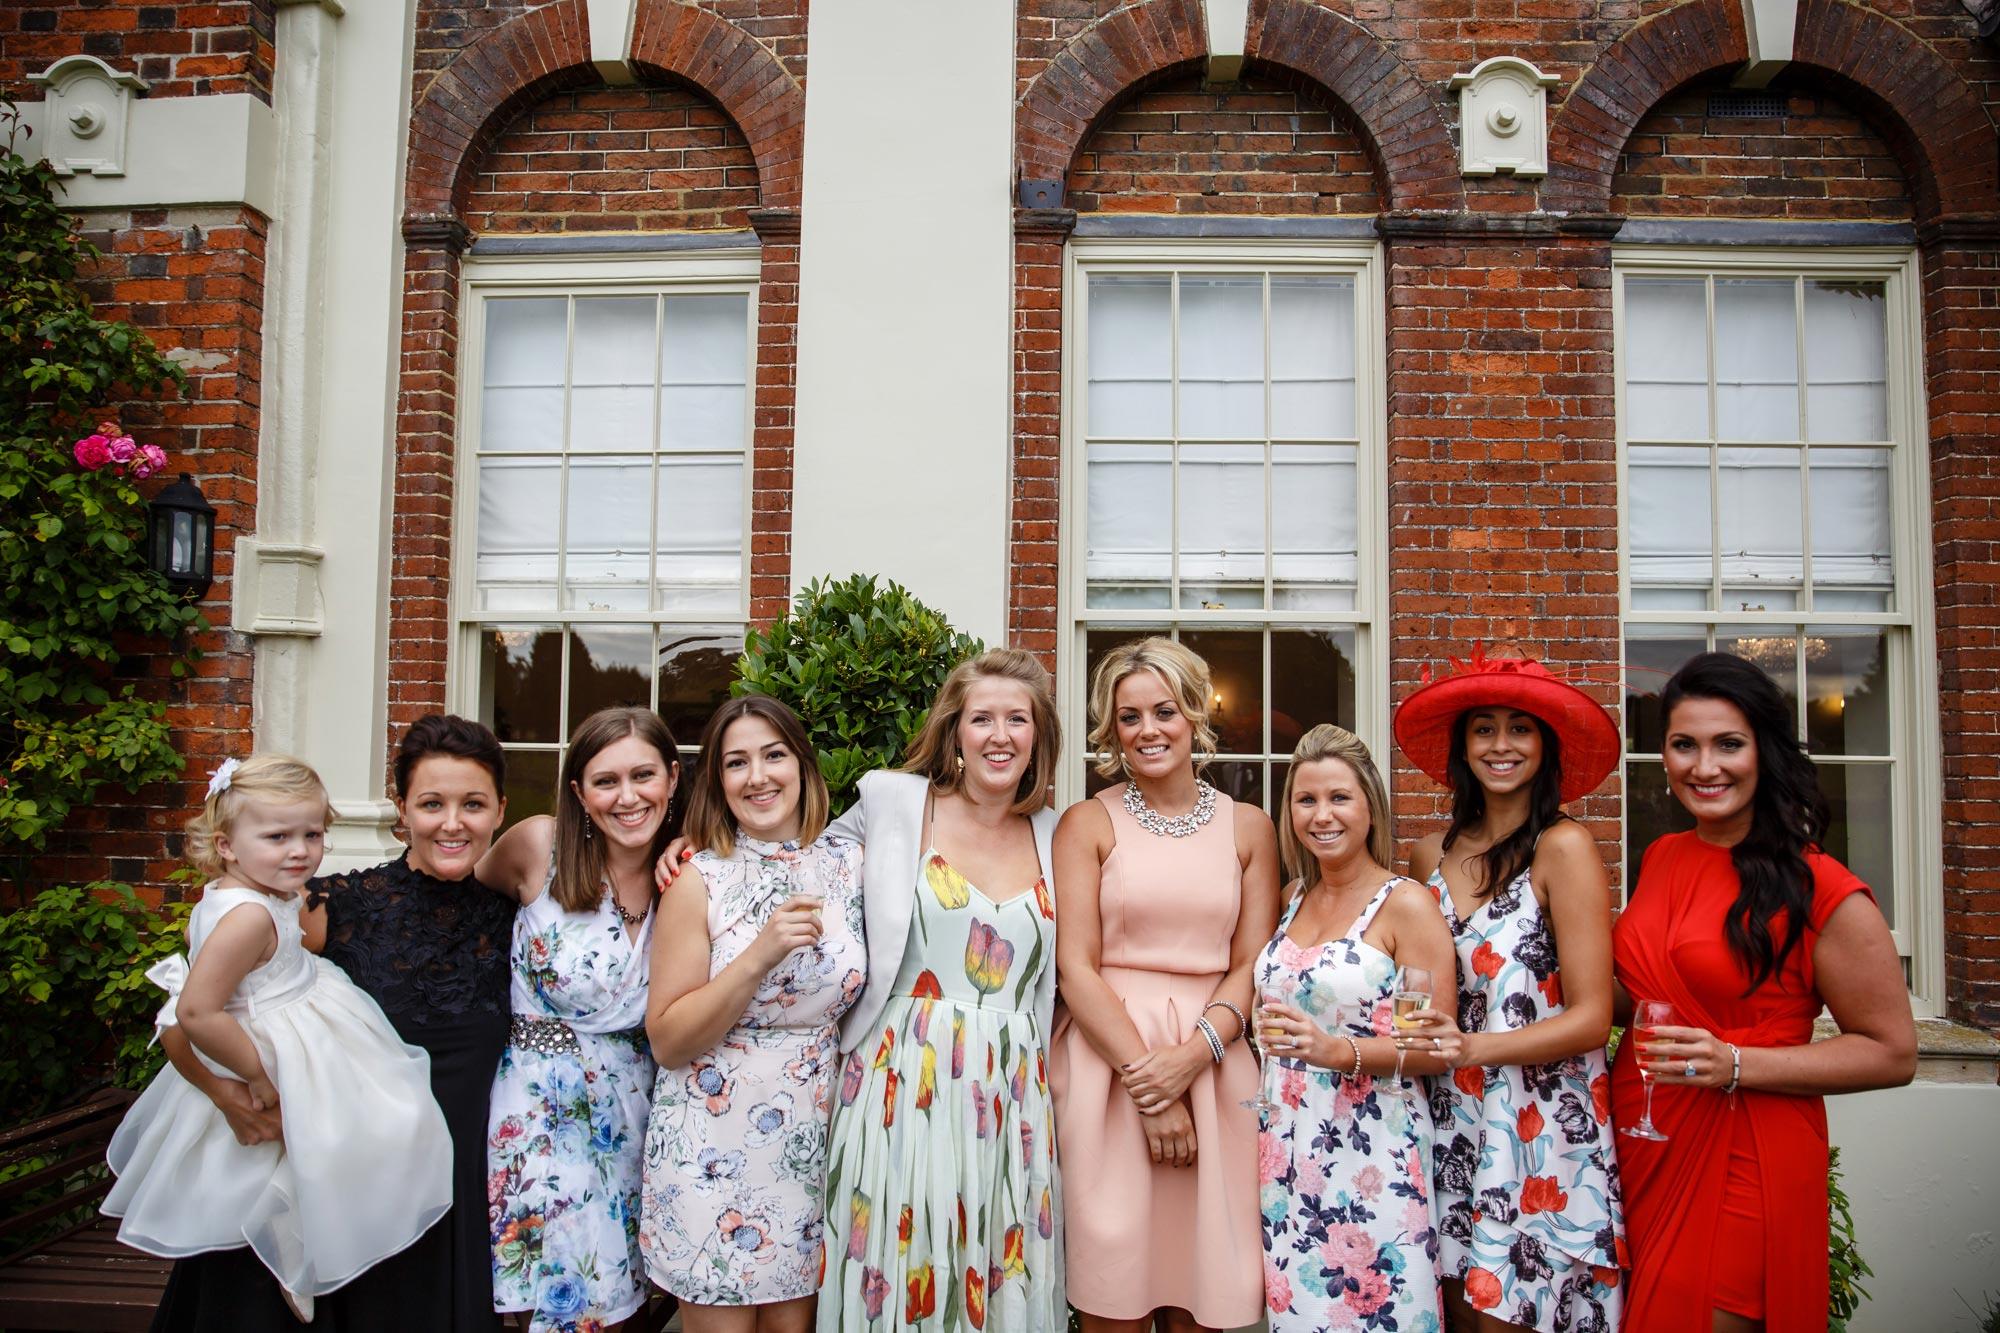 Parklands Quendon Hall Wedding guests